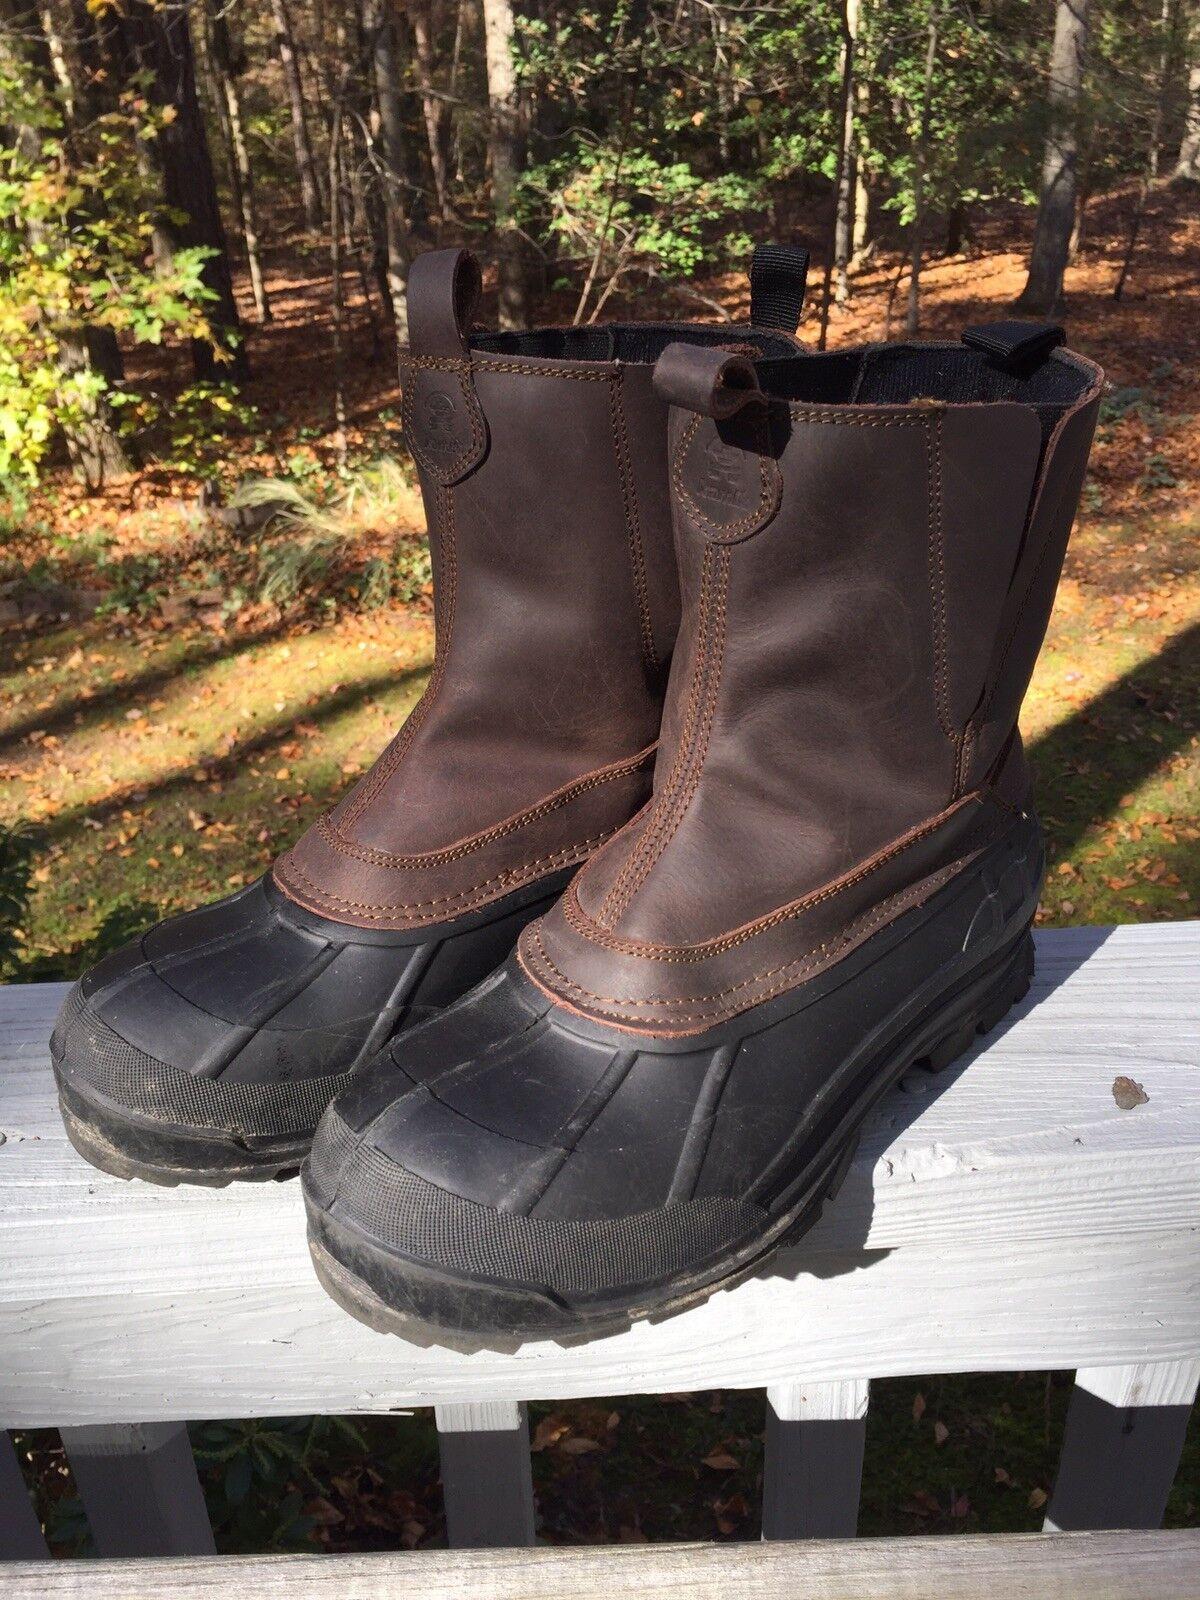 Kamik Dawson Boots, Mens 12D, Thinsulate Lined, EUC